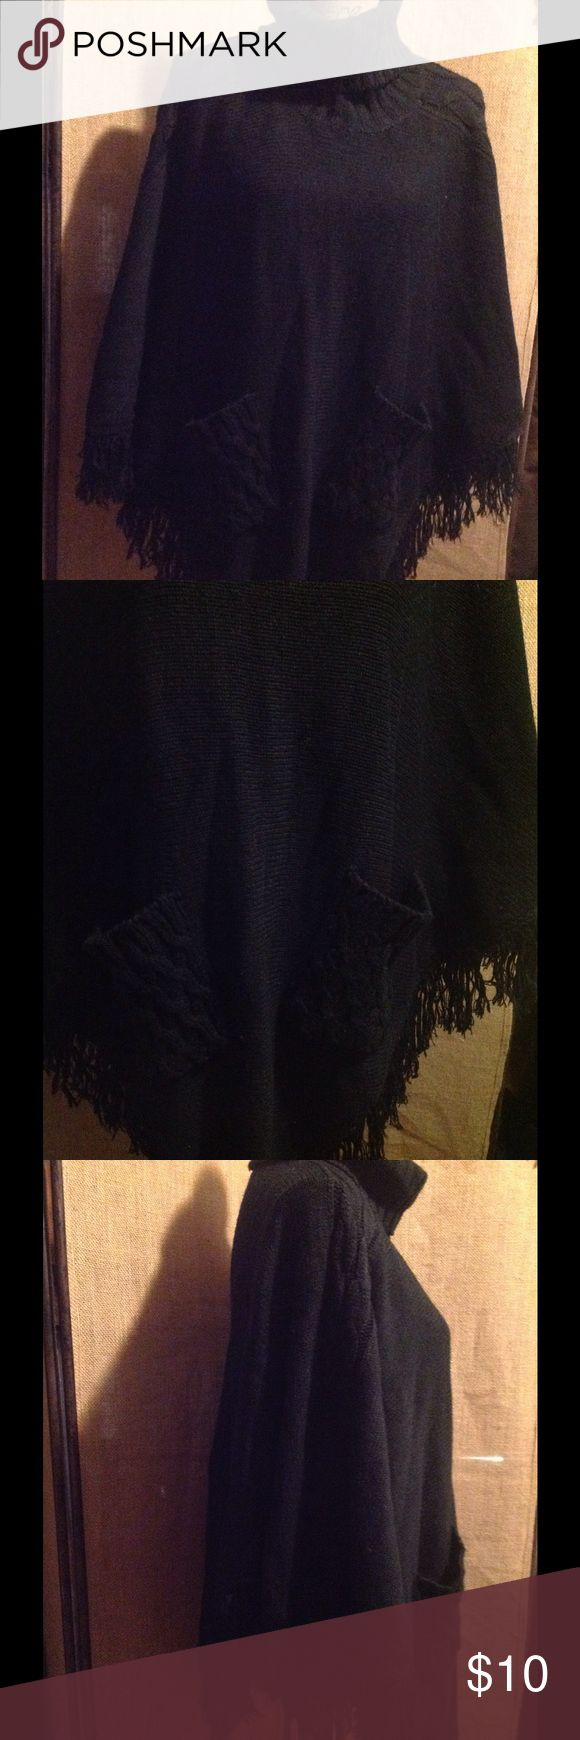 Jennifer Lauren shaw sweater Jennifer Lauren shaw sweater size XL. It is black. Fringed at bottom. Good condition Sweaters Shrugs & Ponchos